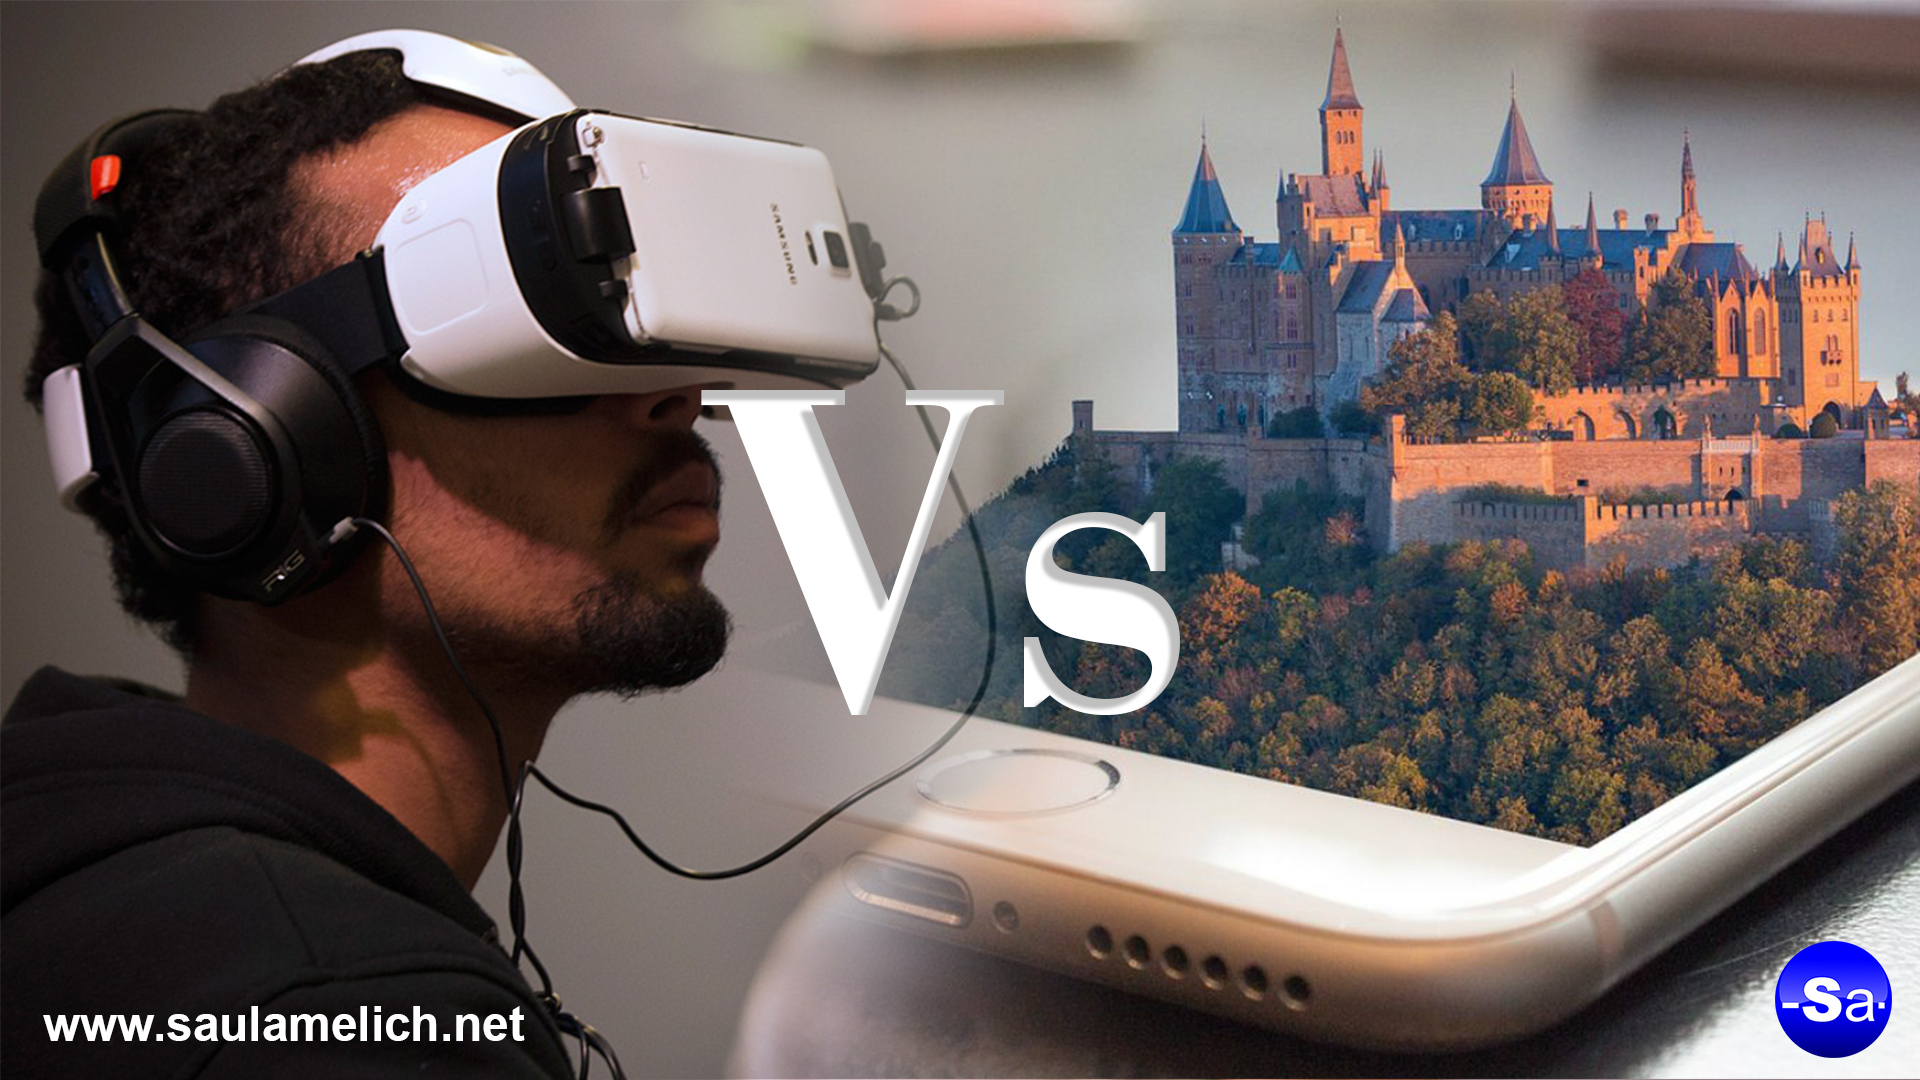 saul ameliach - Realidad Virtual - Mundos